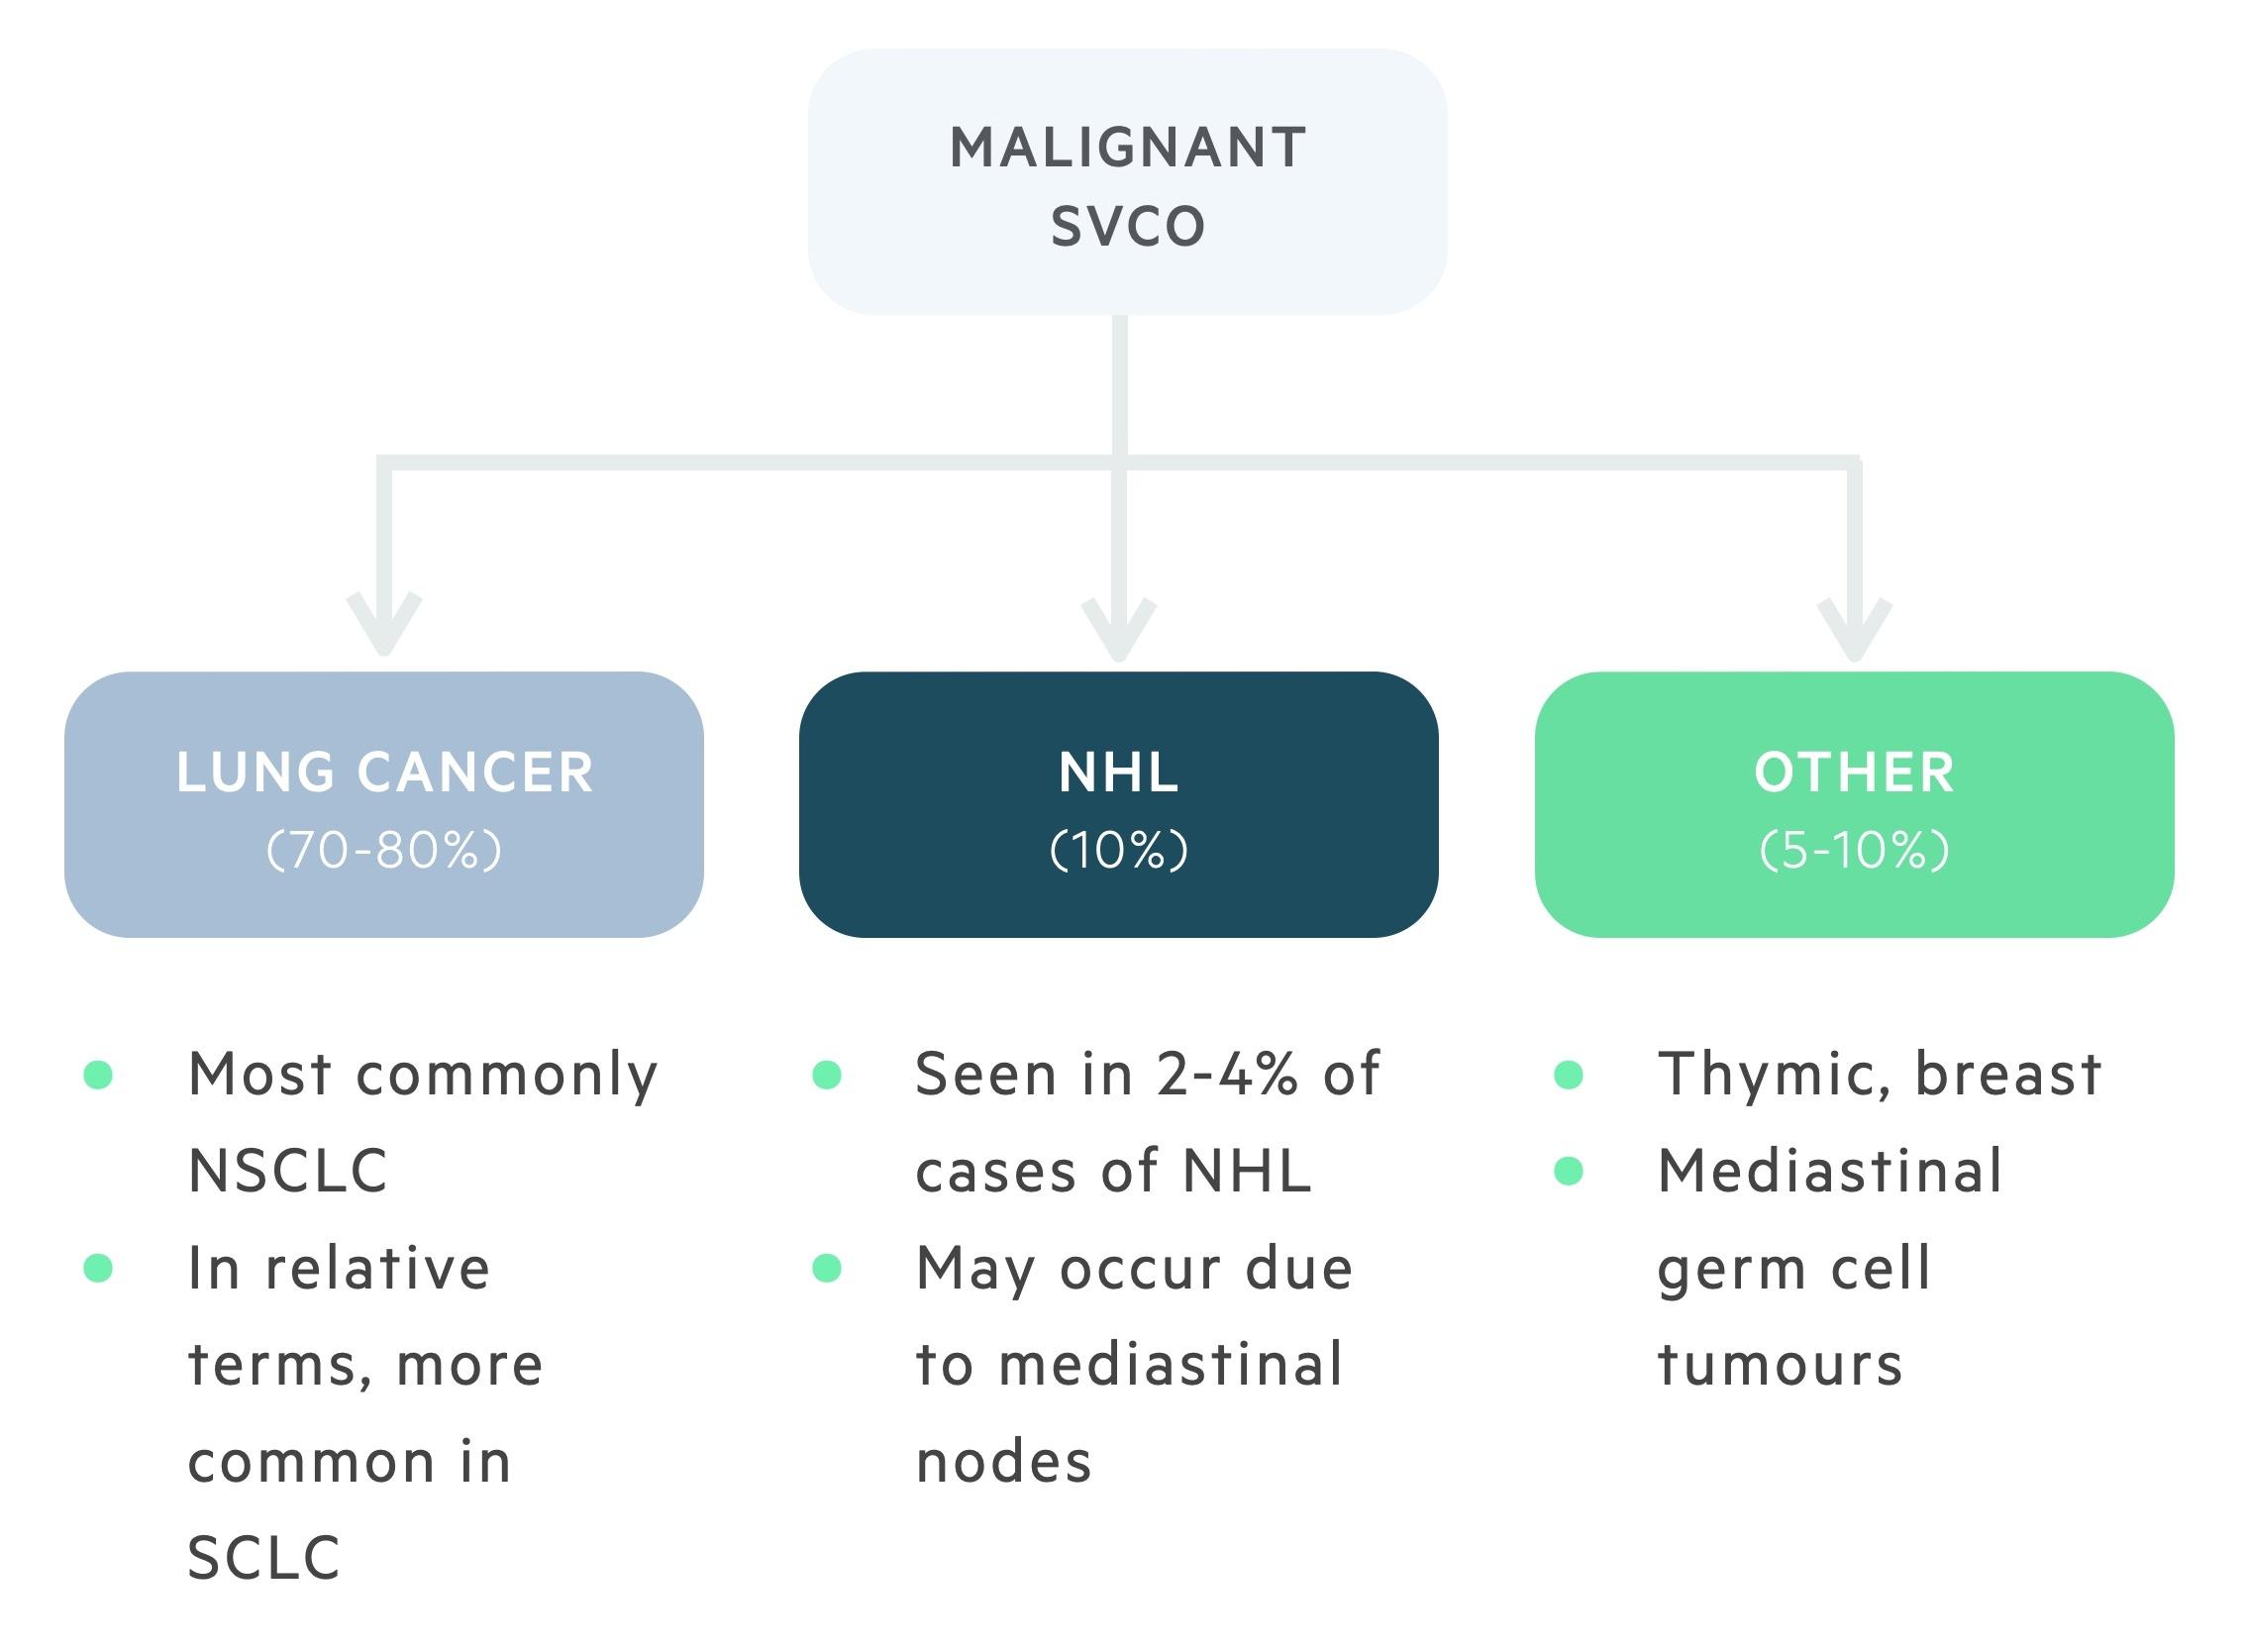 Causes of malignant SVCO